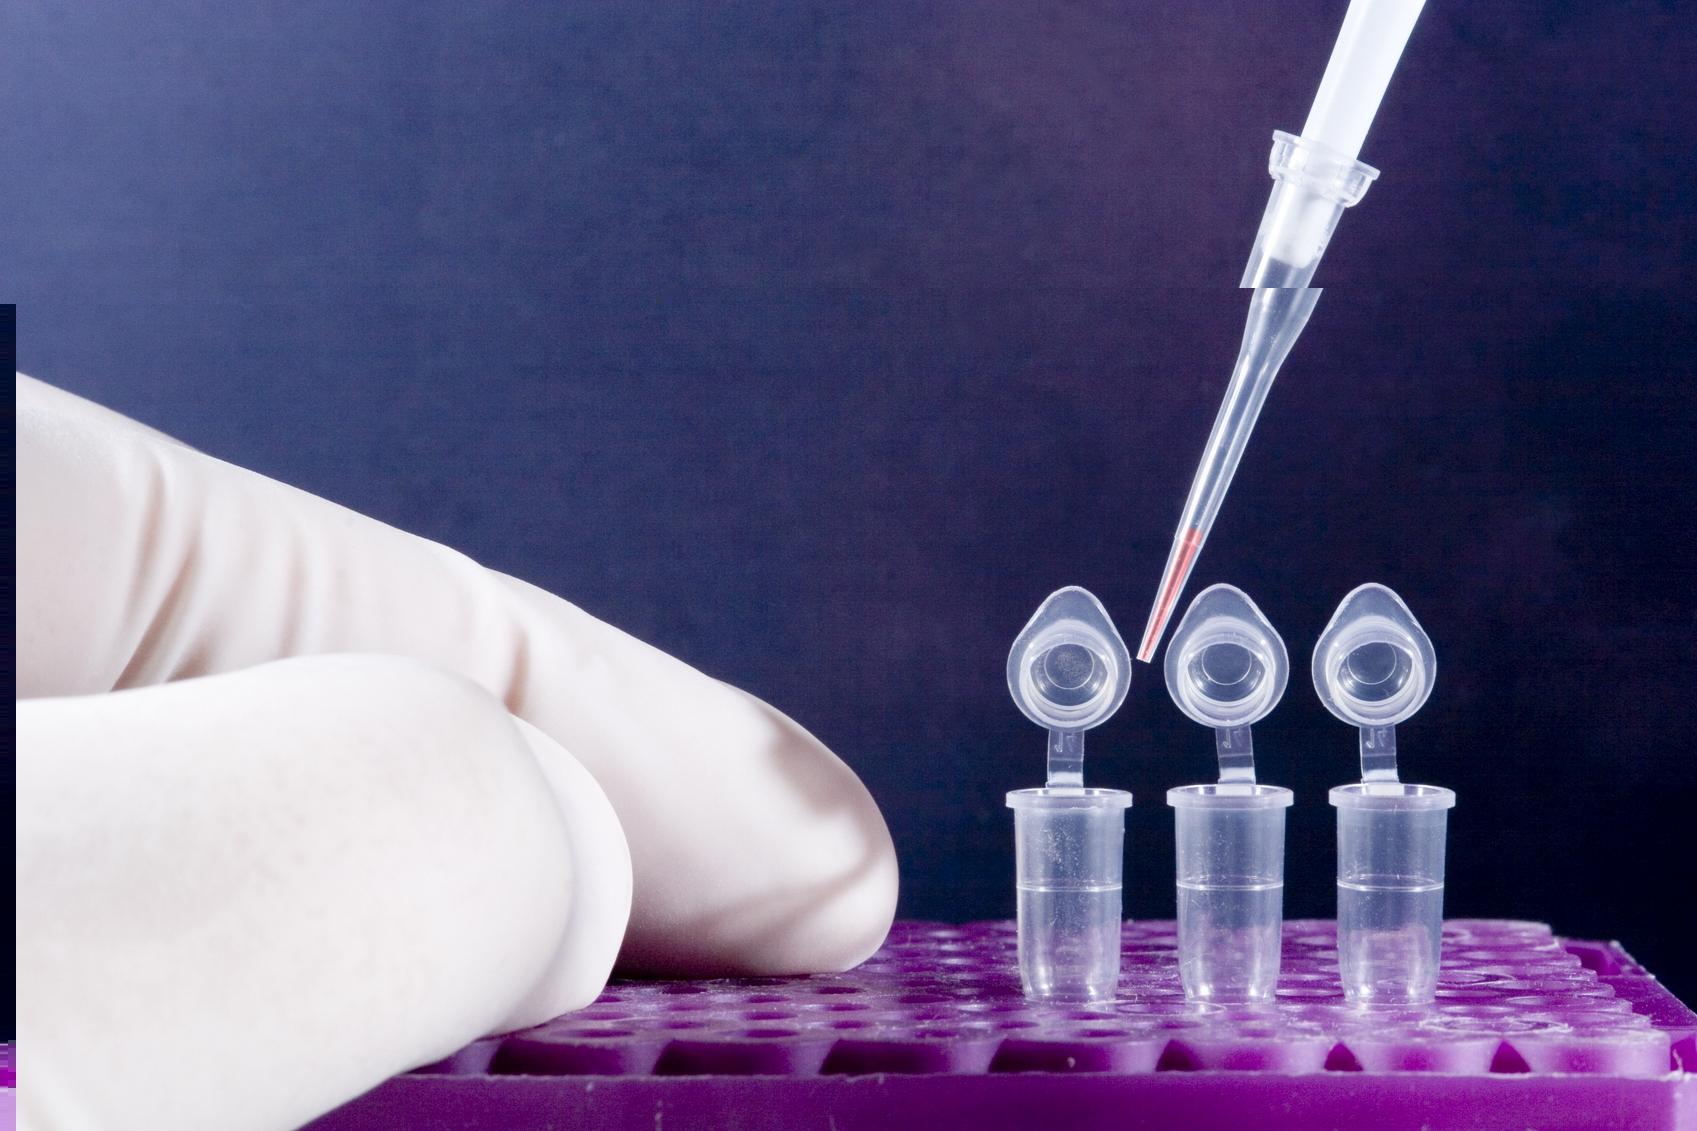 Как проводится ПЦР анализ слюны на туберкулез?